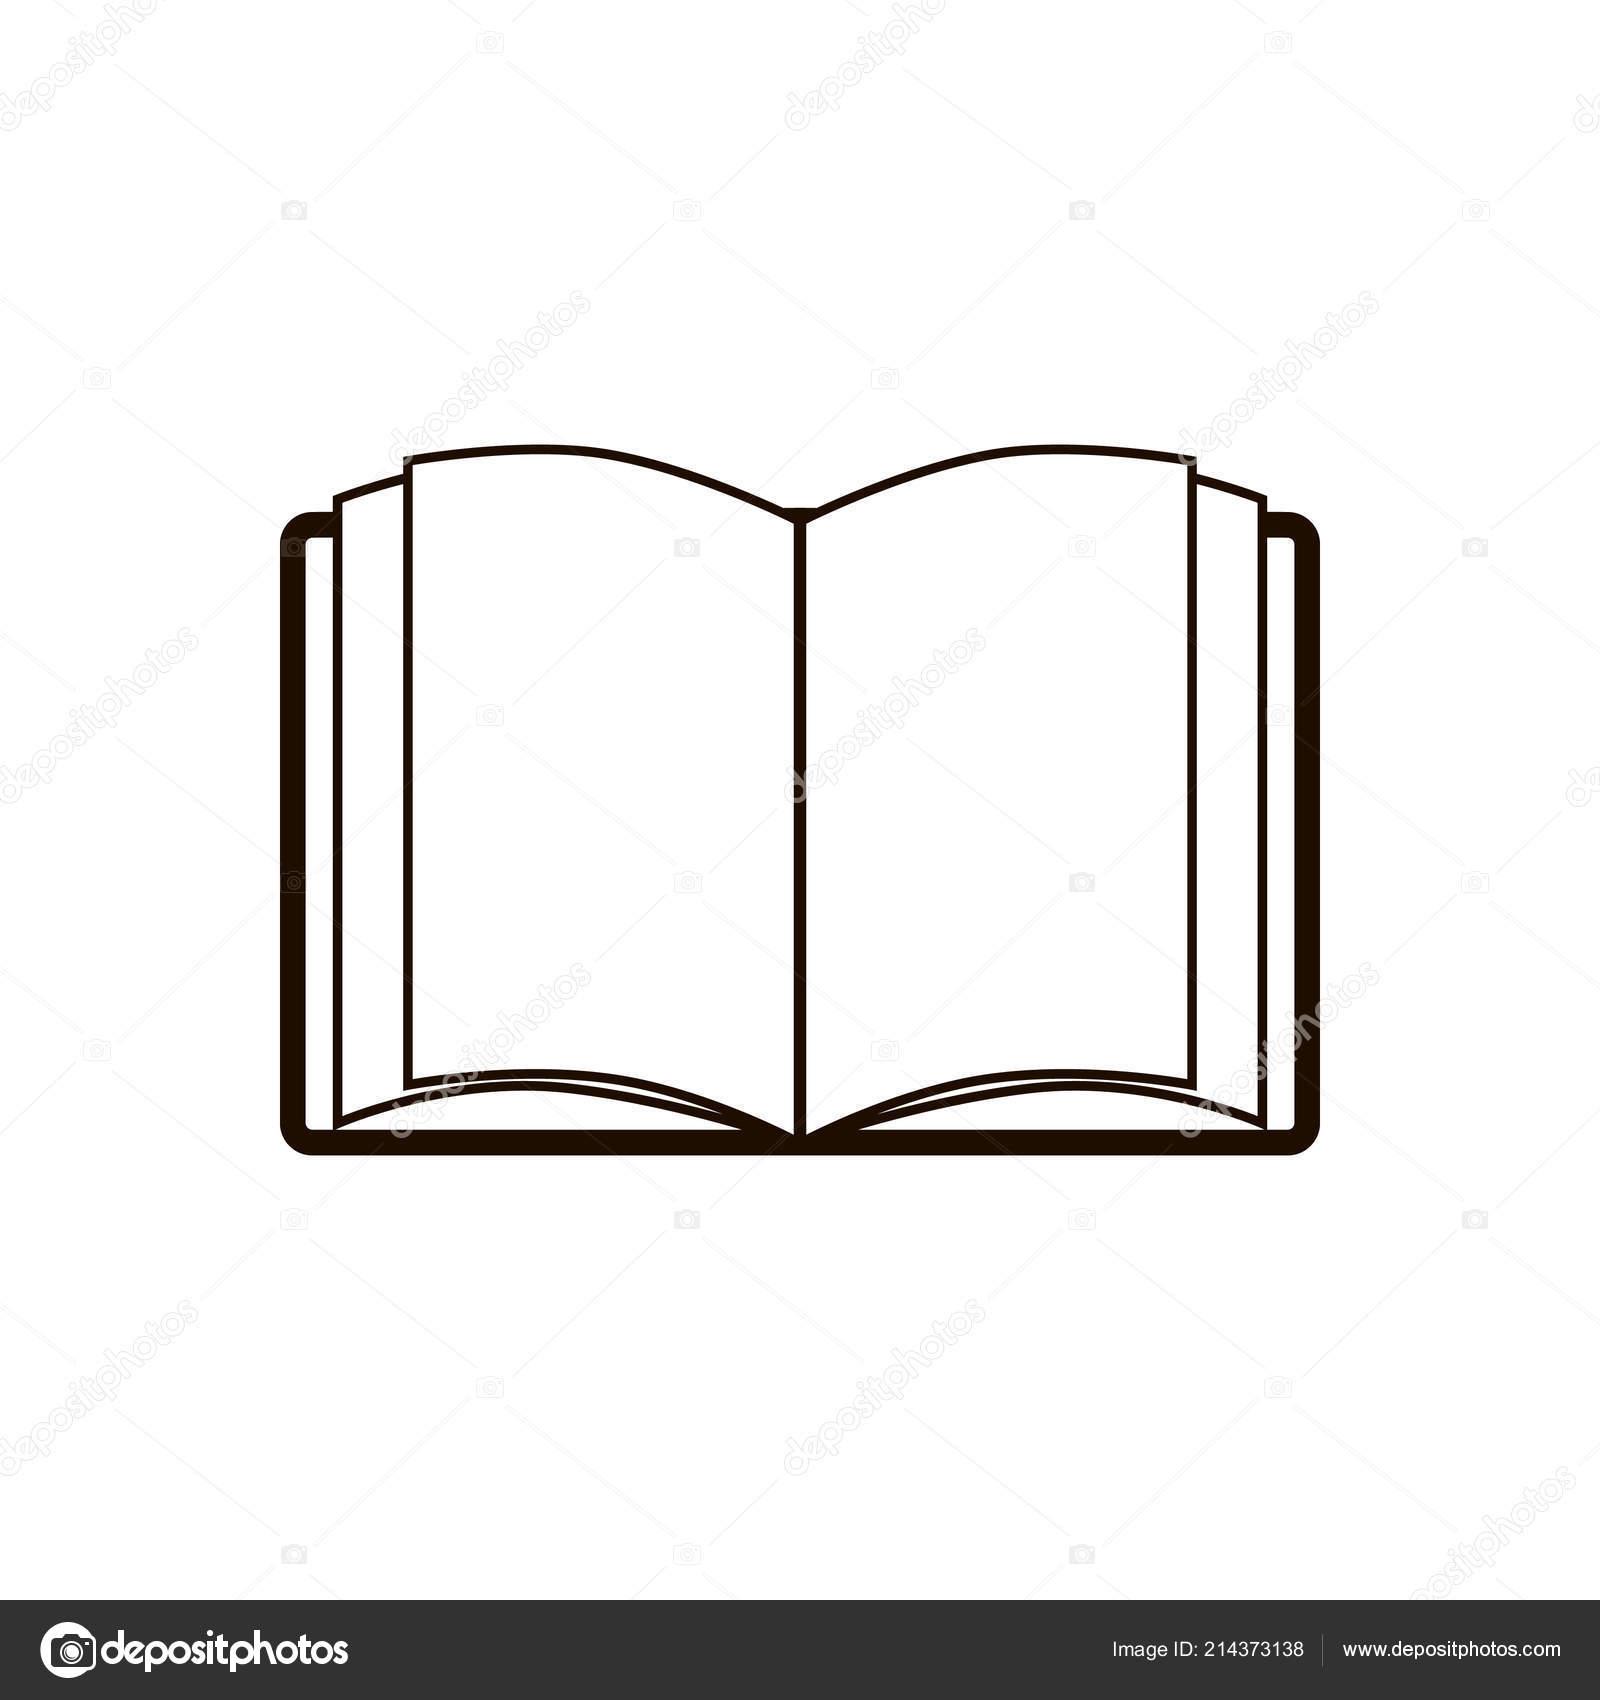 Icone Representant Livre Symbole Education Modele Logo Isole